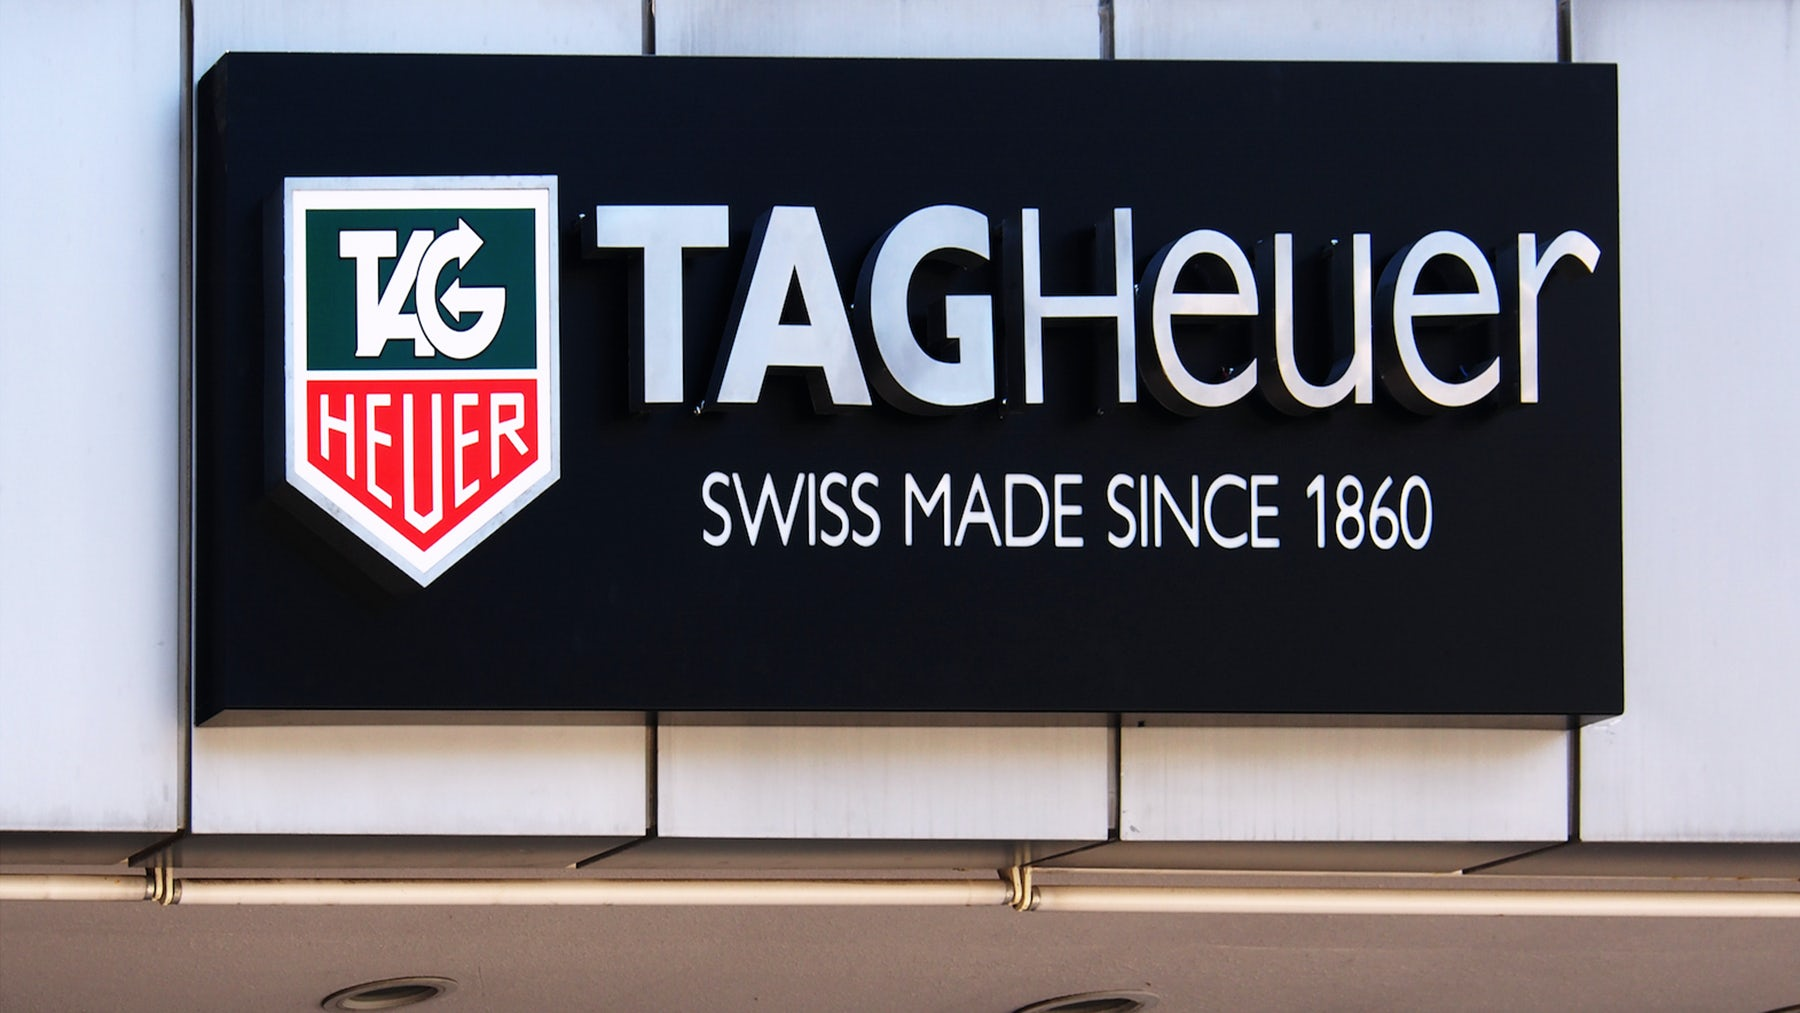 Tag Heuer | Source: Shutterstock